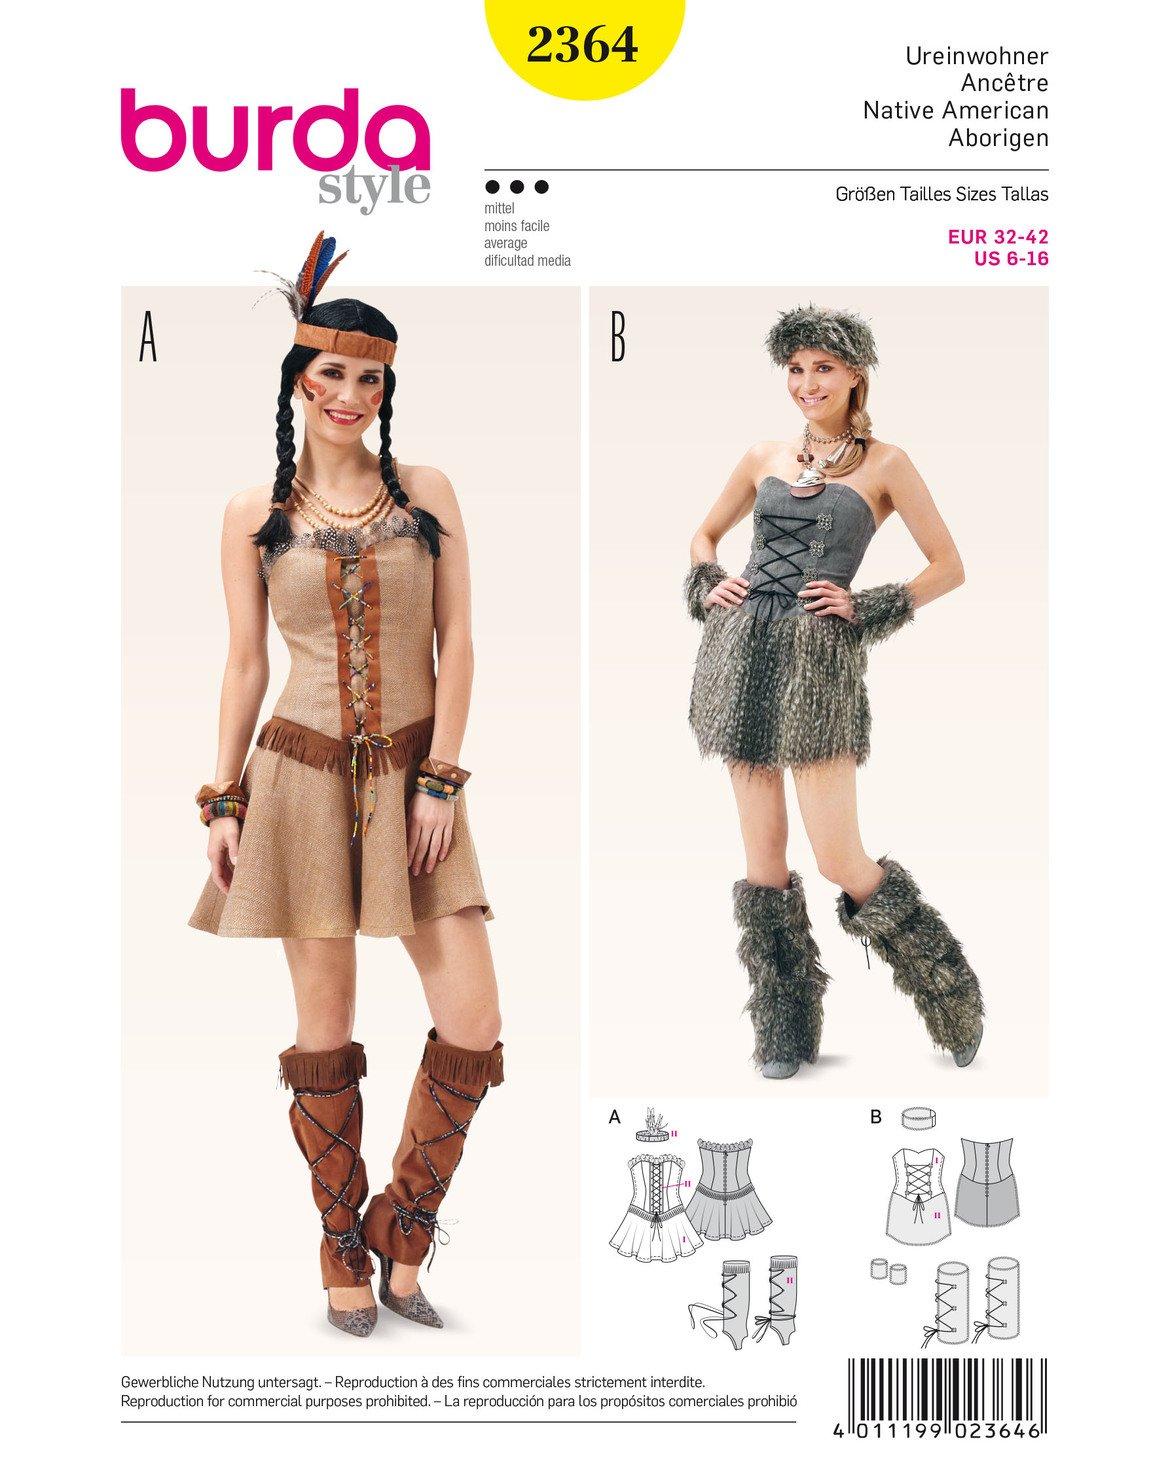 Burda Schnittmuster 2364 Native American Und Stone Age weiß: Amazon ...